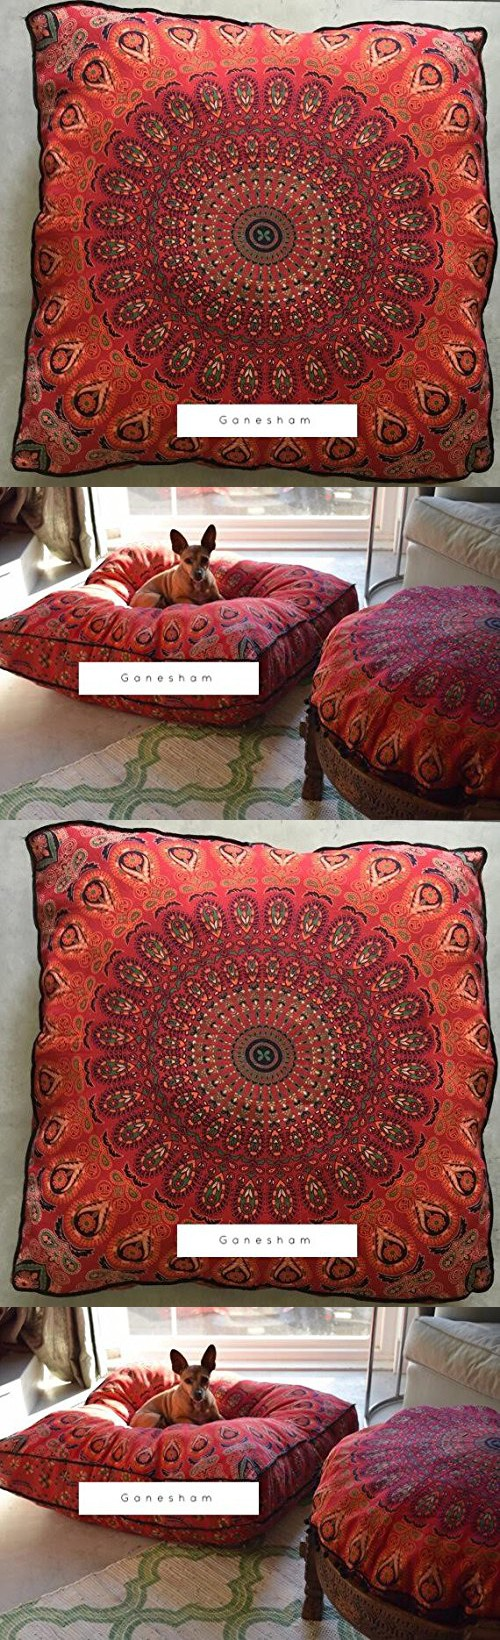 Ganesham Handicraft - Huge mandala tapestry dog bed, mandala ...